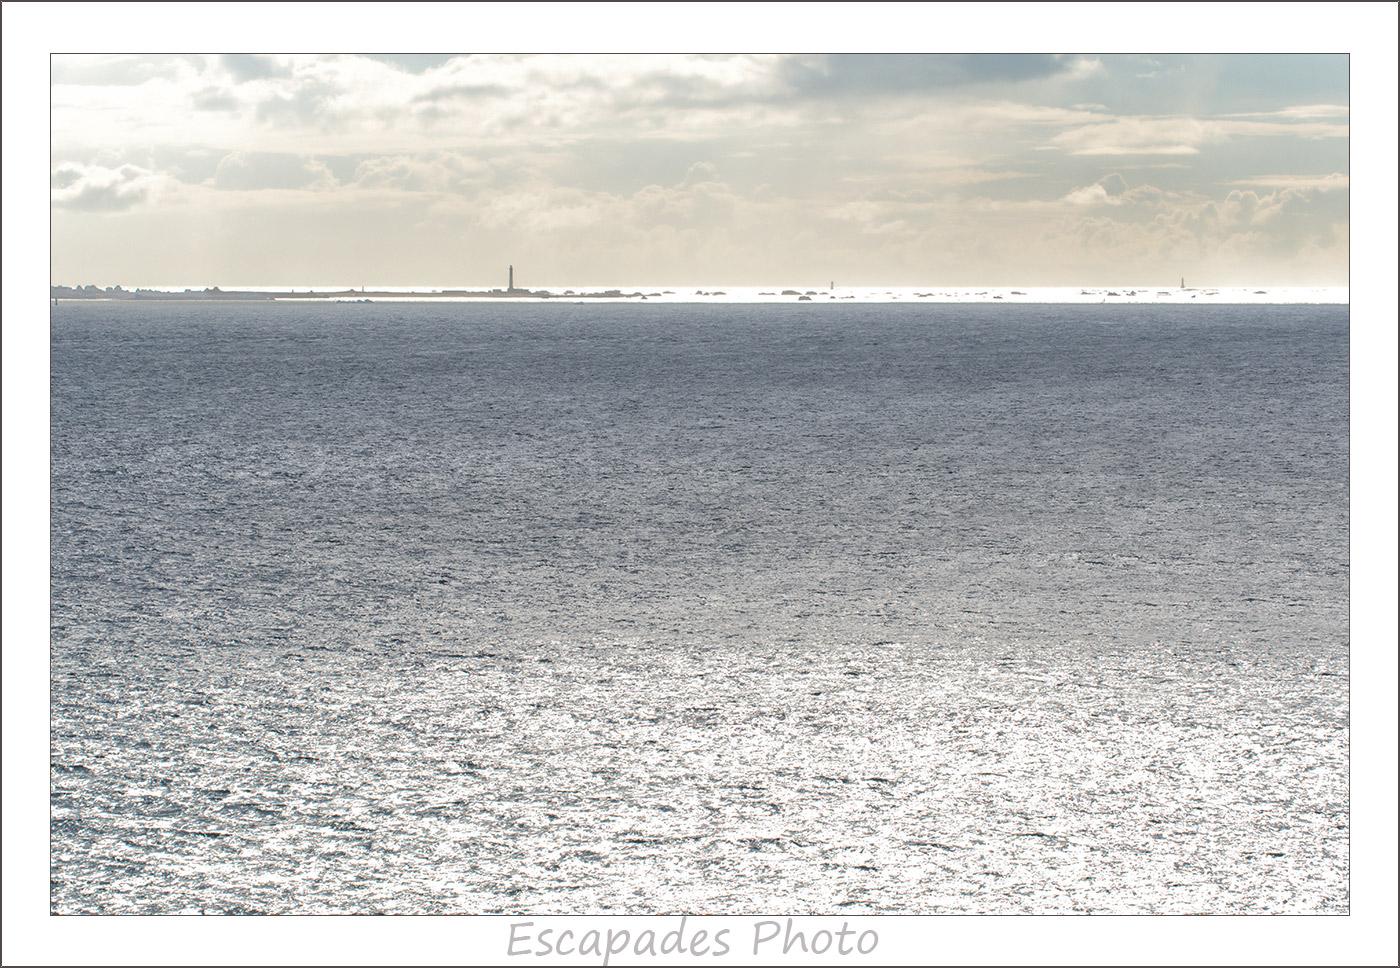 île de Sein vu de la Pointe du Van